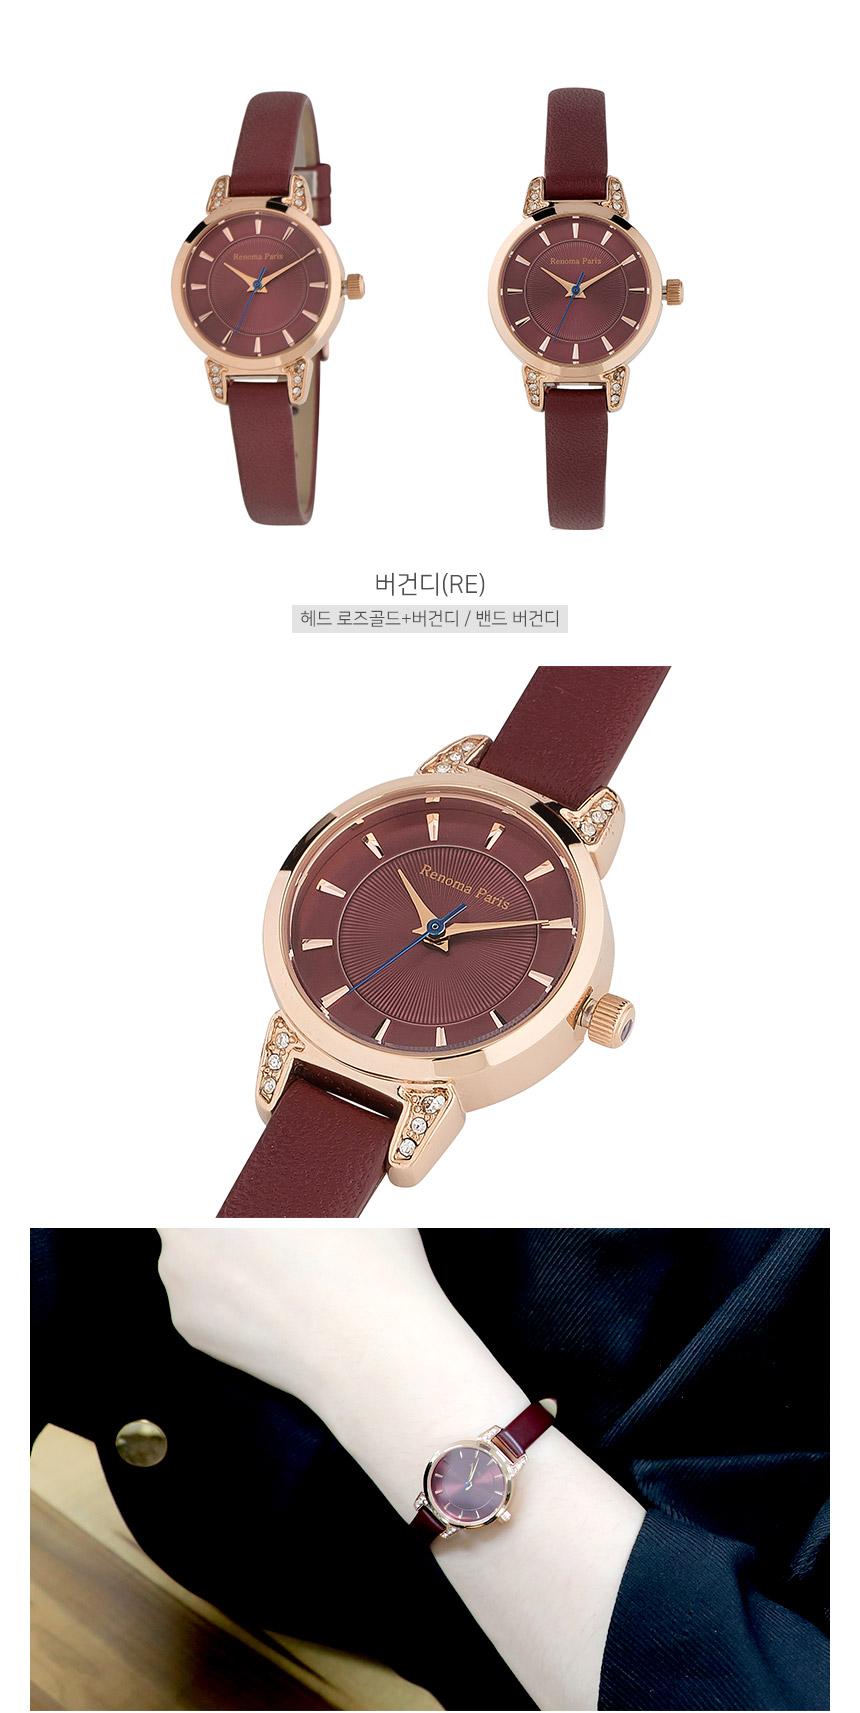 RE485 여성가죽시계/본사직영/본사AS - 란쯔, 178,000원, 여성시계, 가죽시계